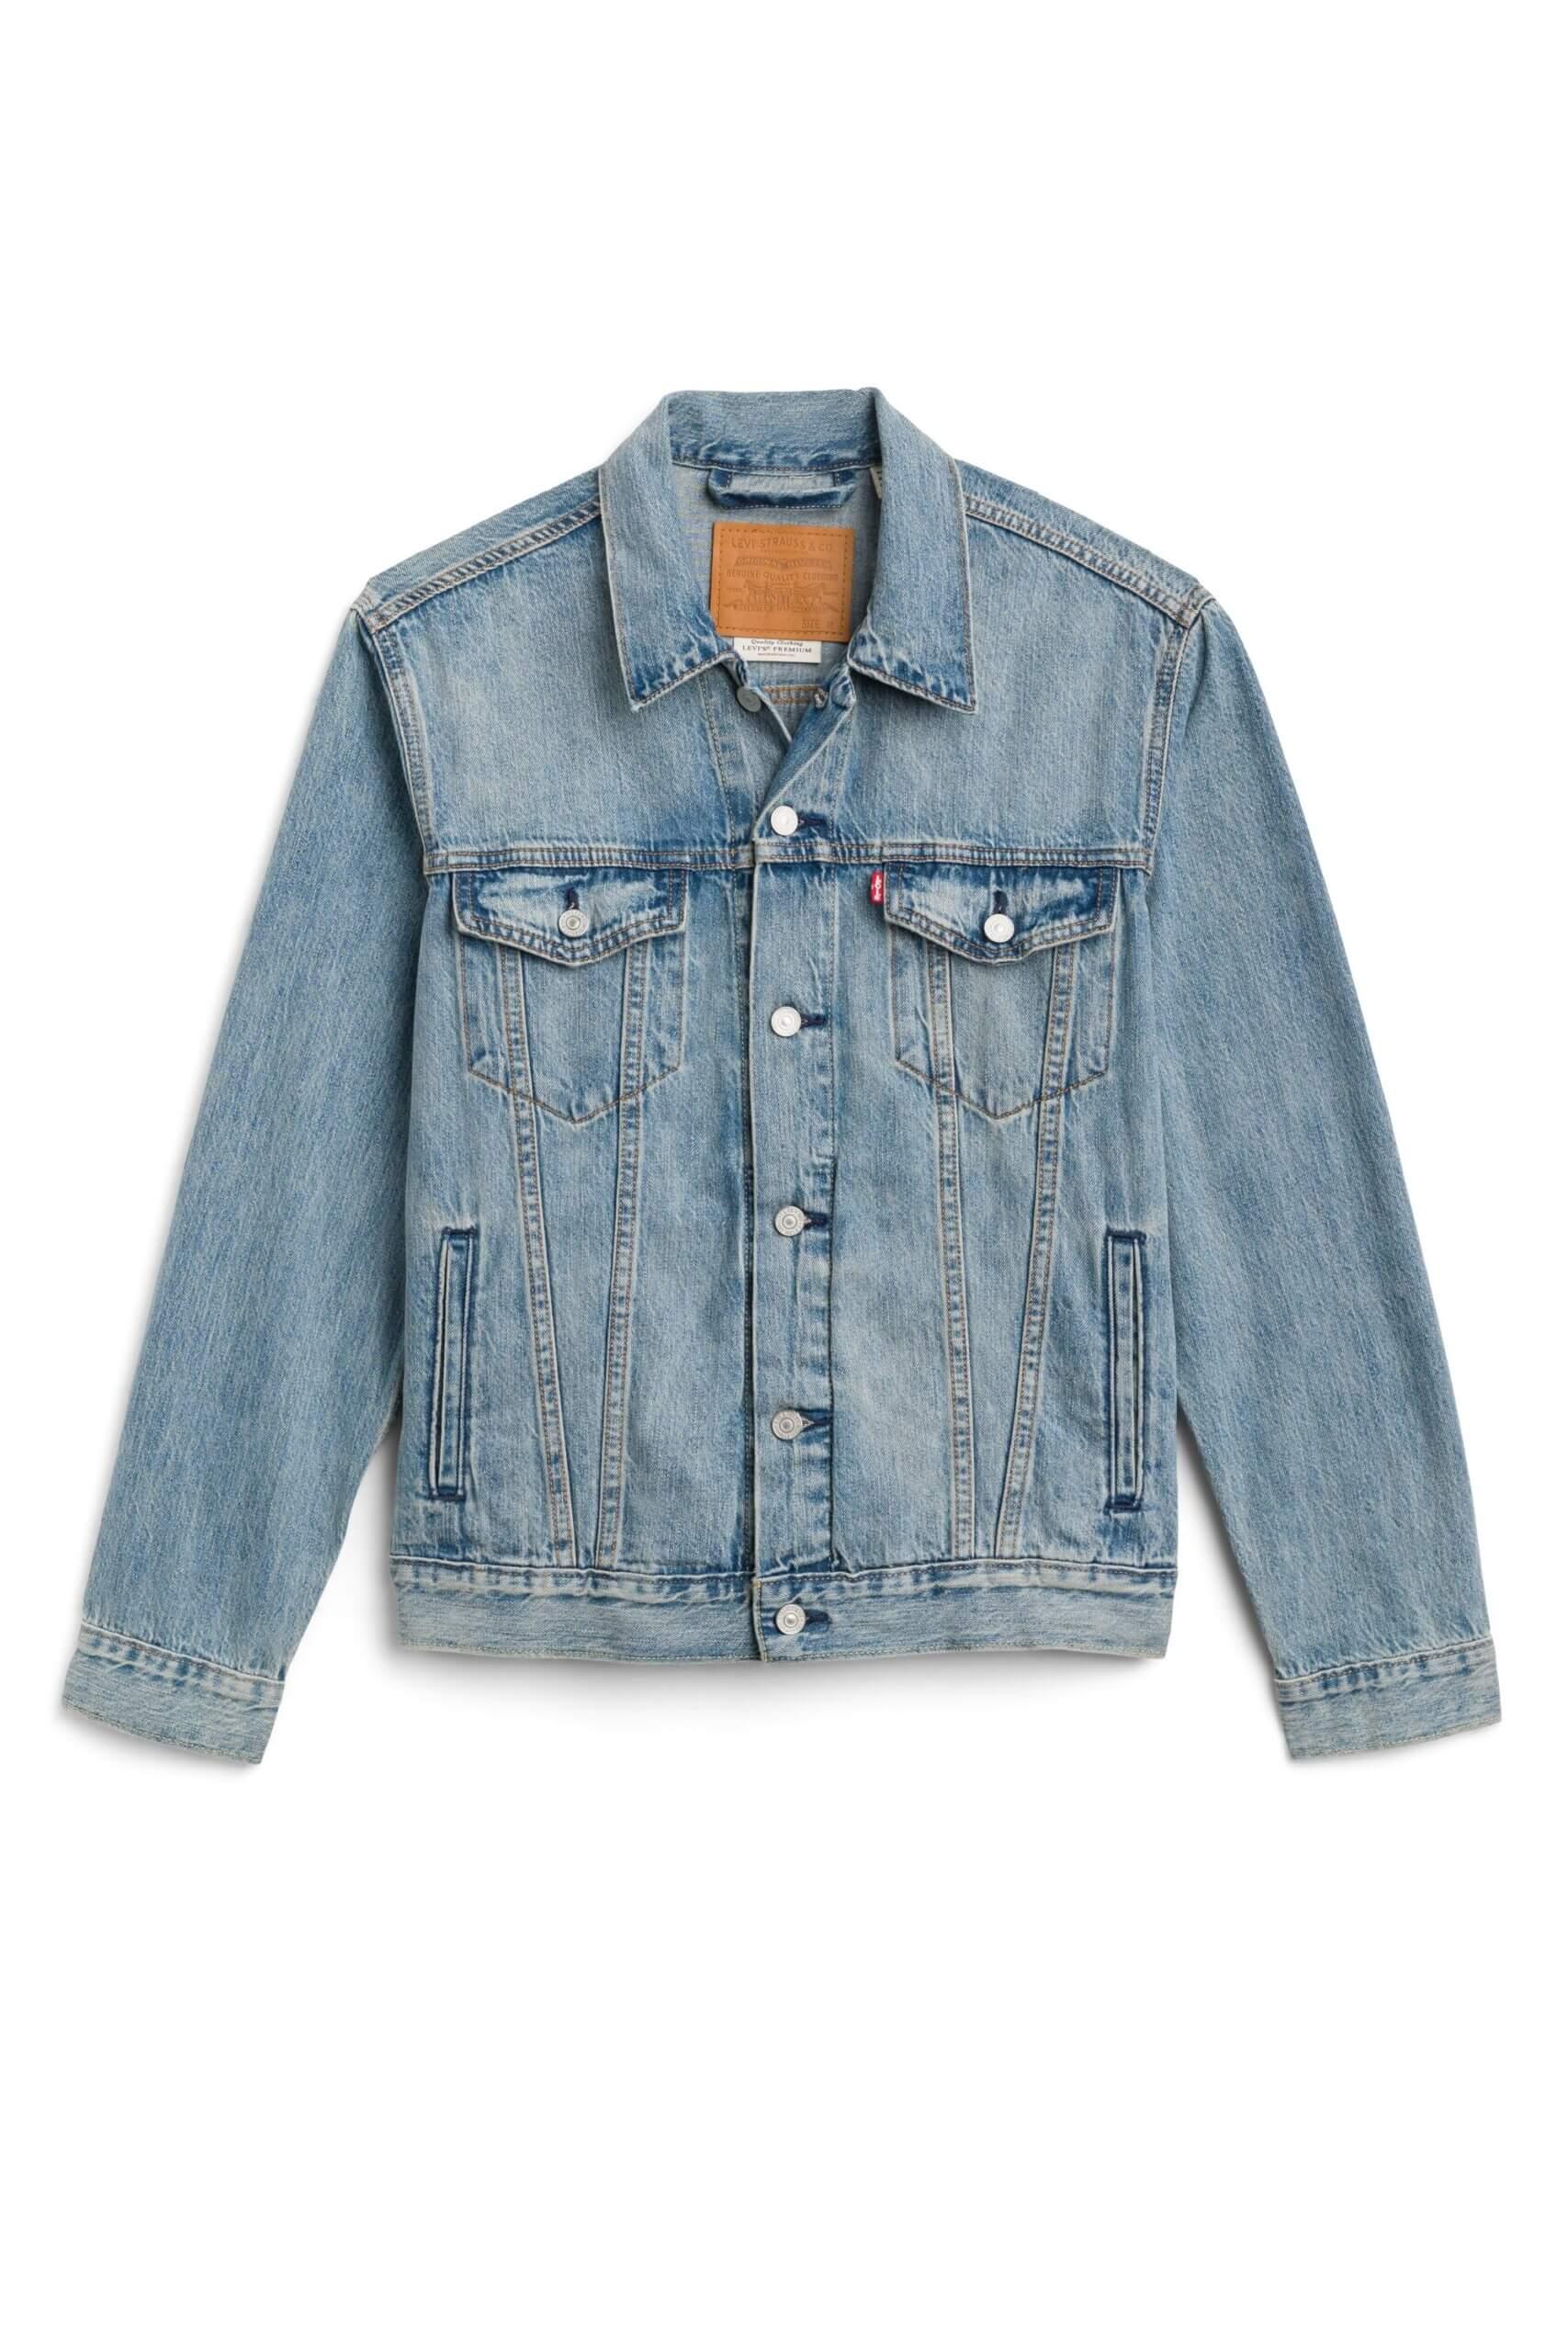 Stitch Fix Men's blue denim jacket.